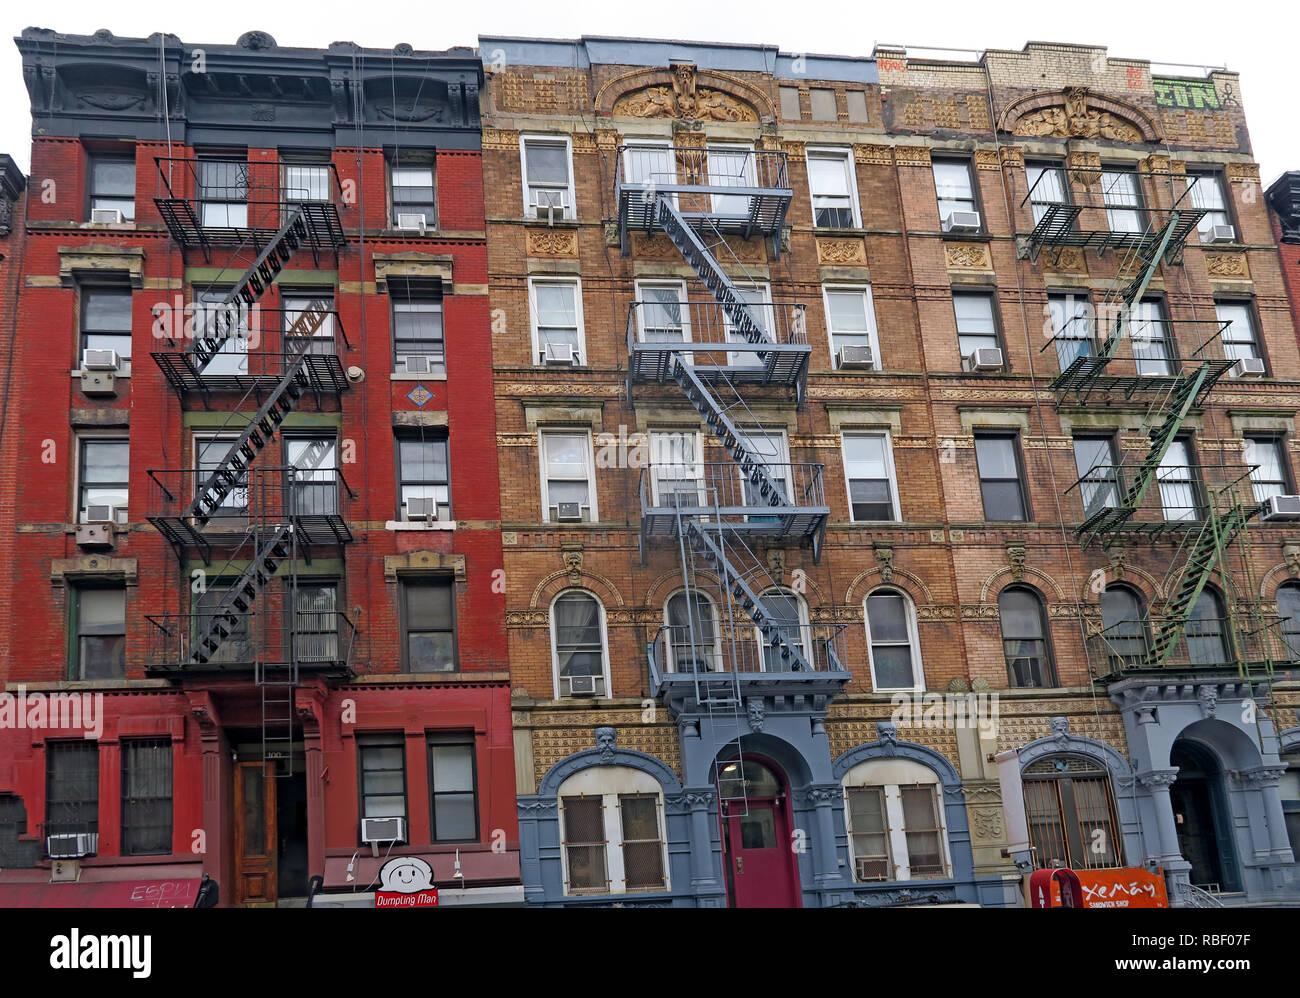 GoTonySmith,@HotpixUK,HotpixUK,NOHO NYC,New,York,St,Marks,Place,street,New York Street,USA,America,City Centre,city,centre,center,city center,East Village,Eastvillage,New,York,Travel,Tourism,98,LedZep,98,Saint,Marks,Place,Manhattan,rock,band,Physical Graffiti,Physical Graffitea,from,Physical Graffiti album,New York City,NY,tenement,history,historic,Album Sleeve,location,Peter Corriston,die-cut,sleeve design,sleeve,design,96,and,98,East,8th,Street